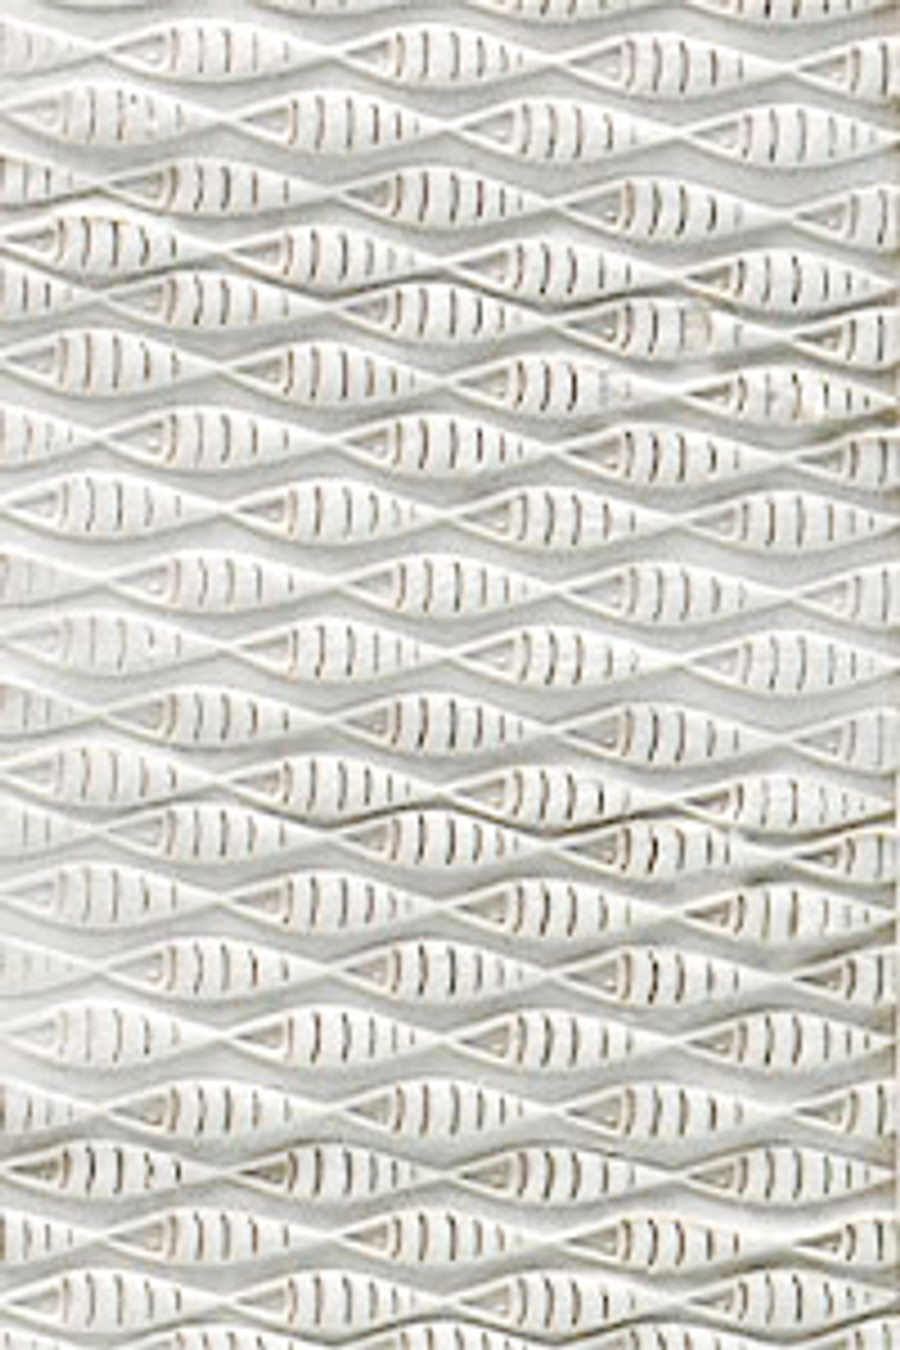 Acrylic Texture Roller - School of Fish 5cm